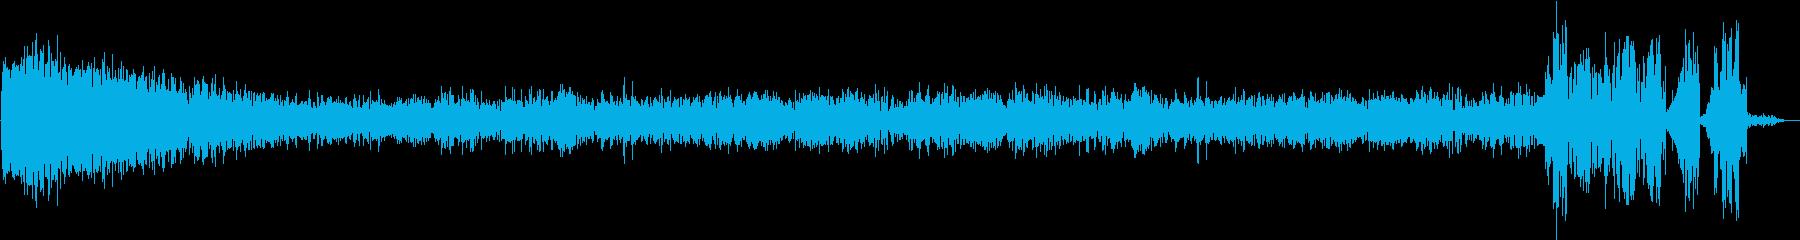 SciFi EC01_93_2の再生済みの波形